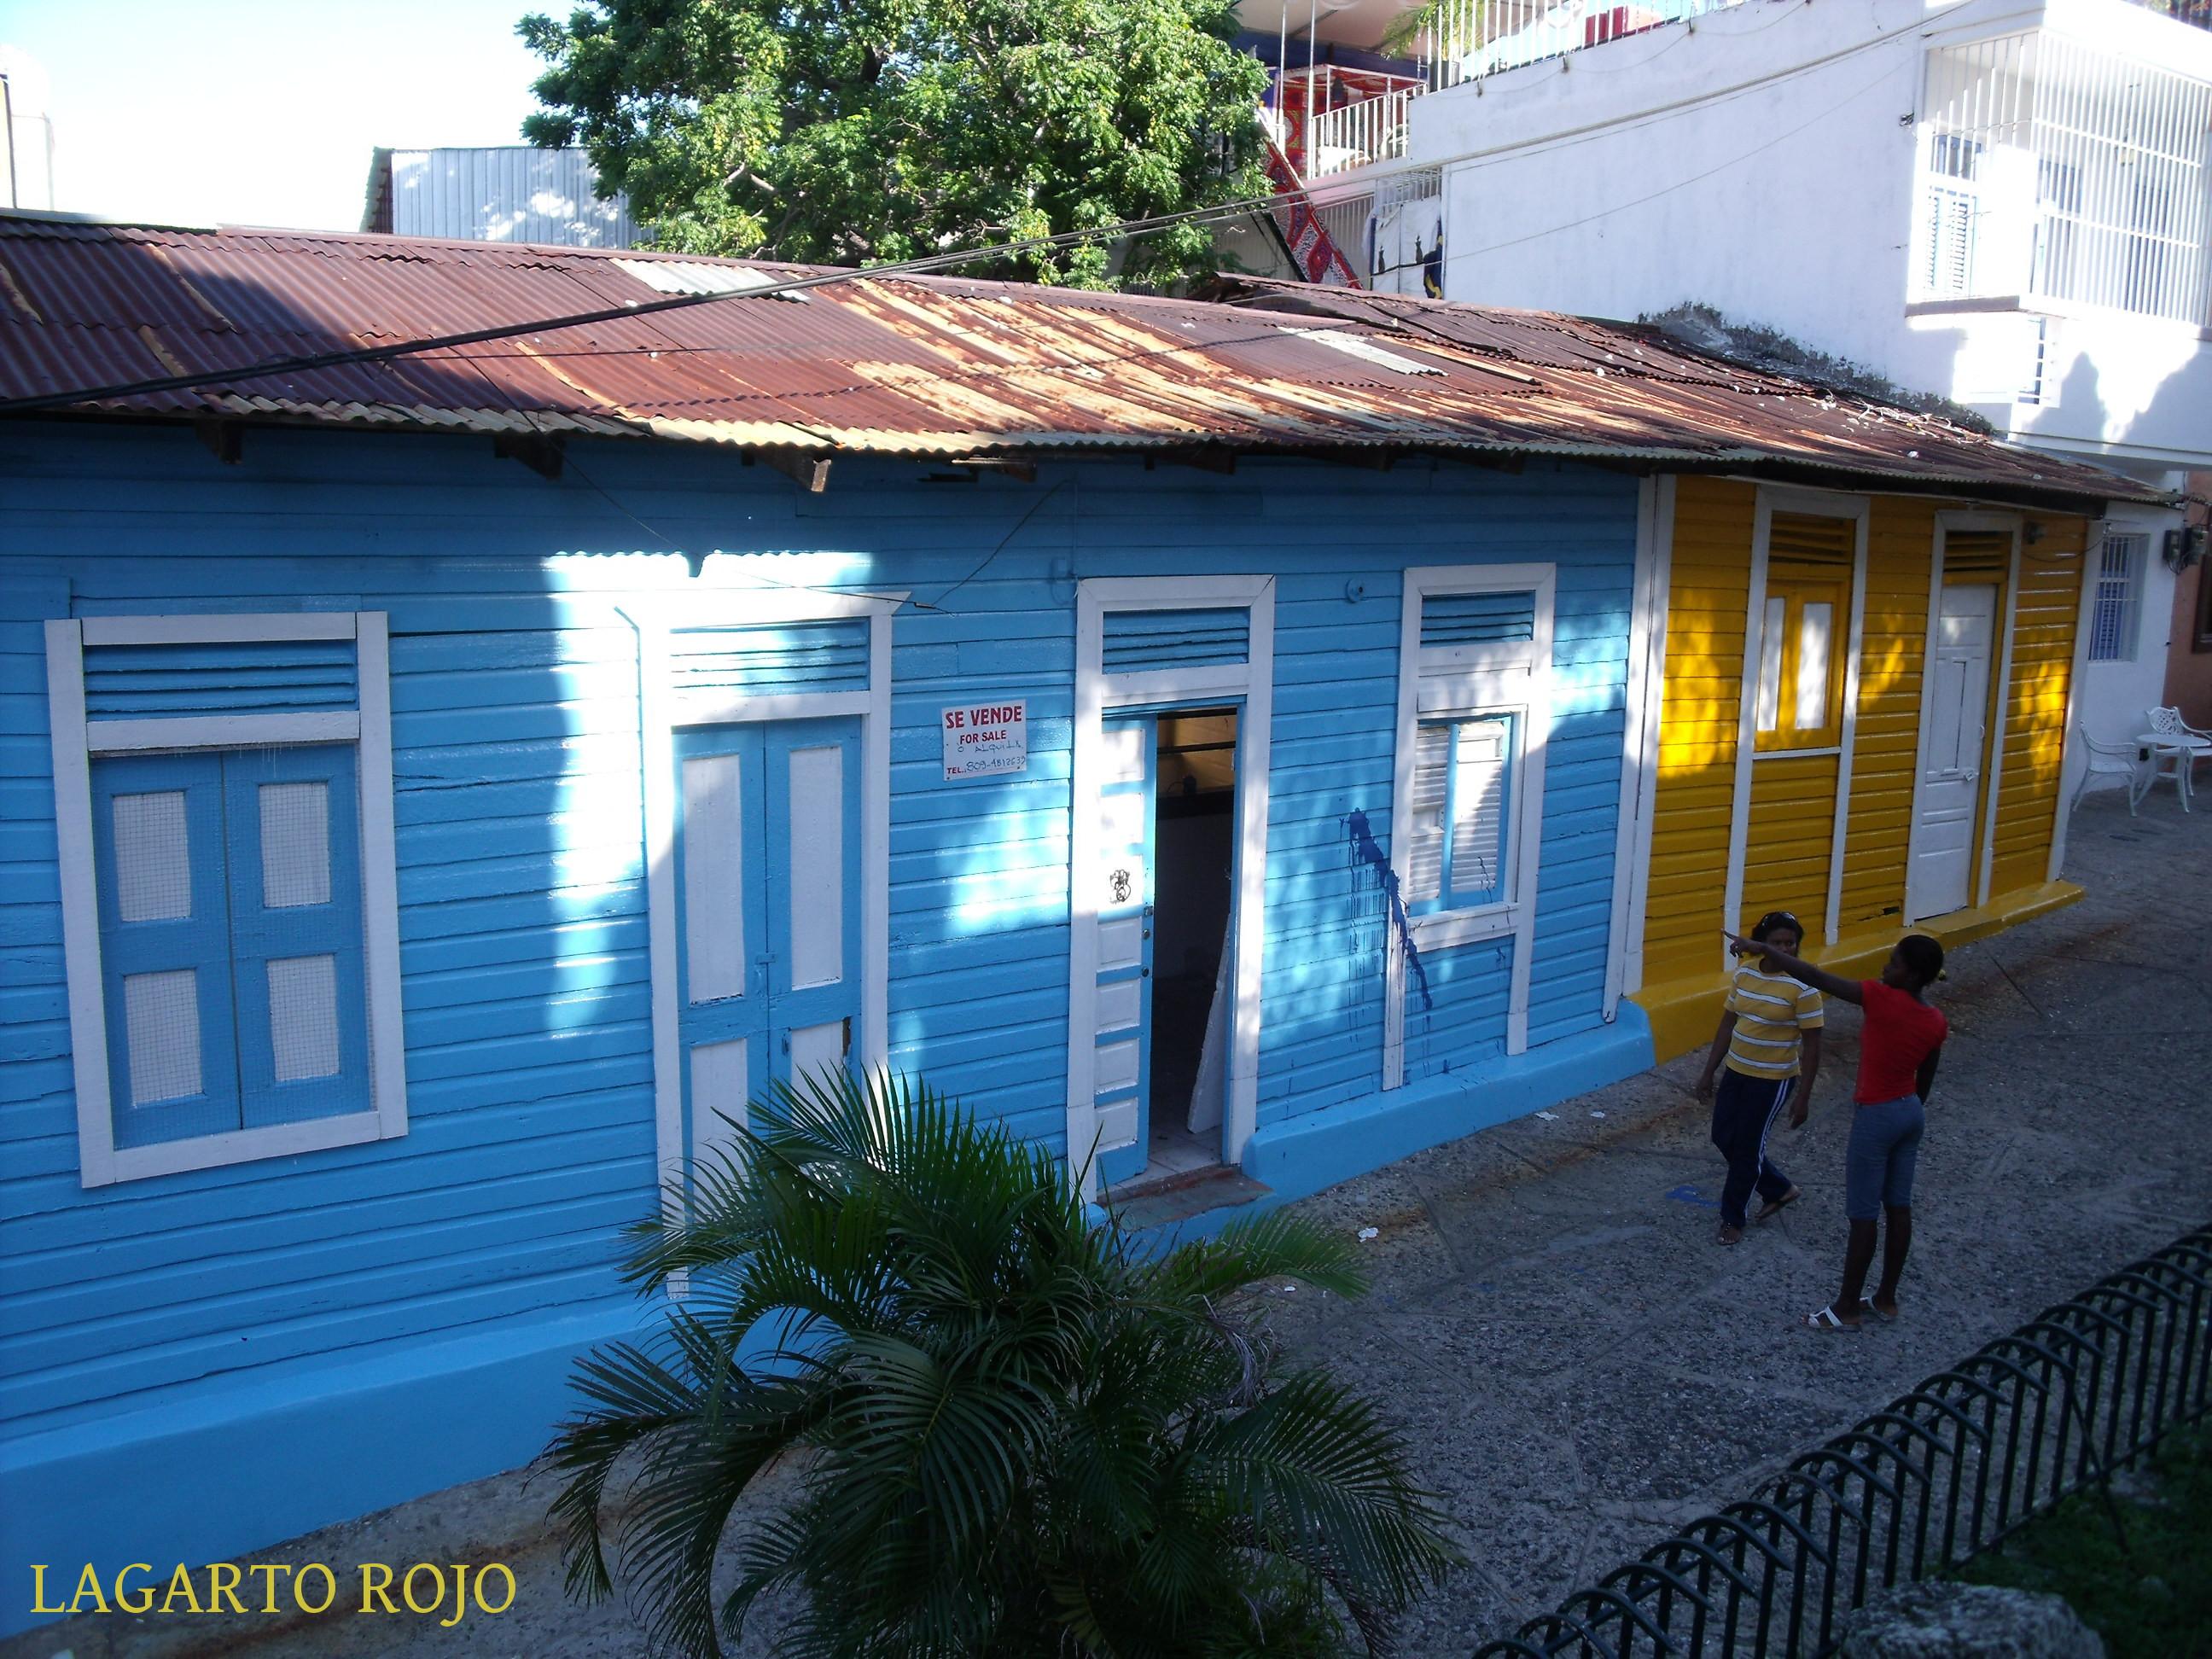 Santo domingo donde naci am rica lagarto rojo for Colores de casas pintadas por fuera